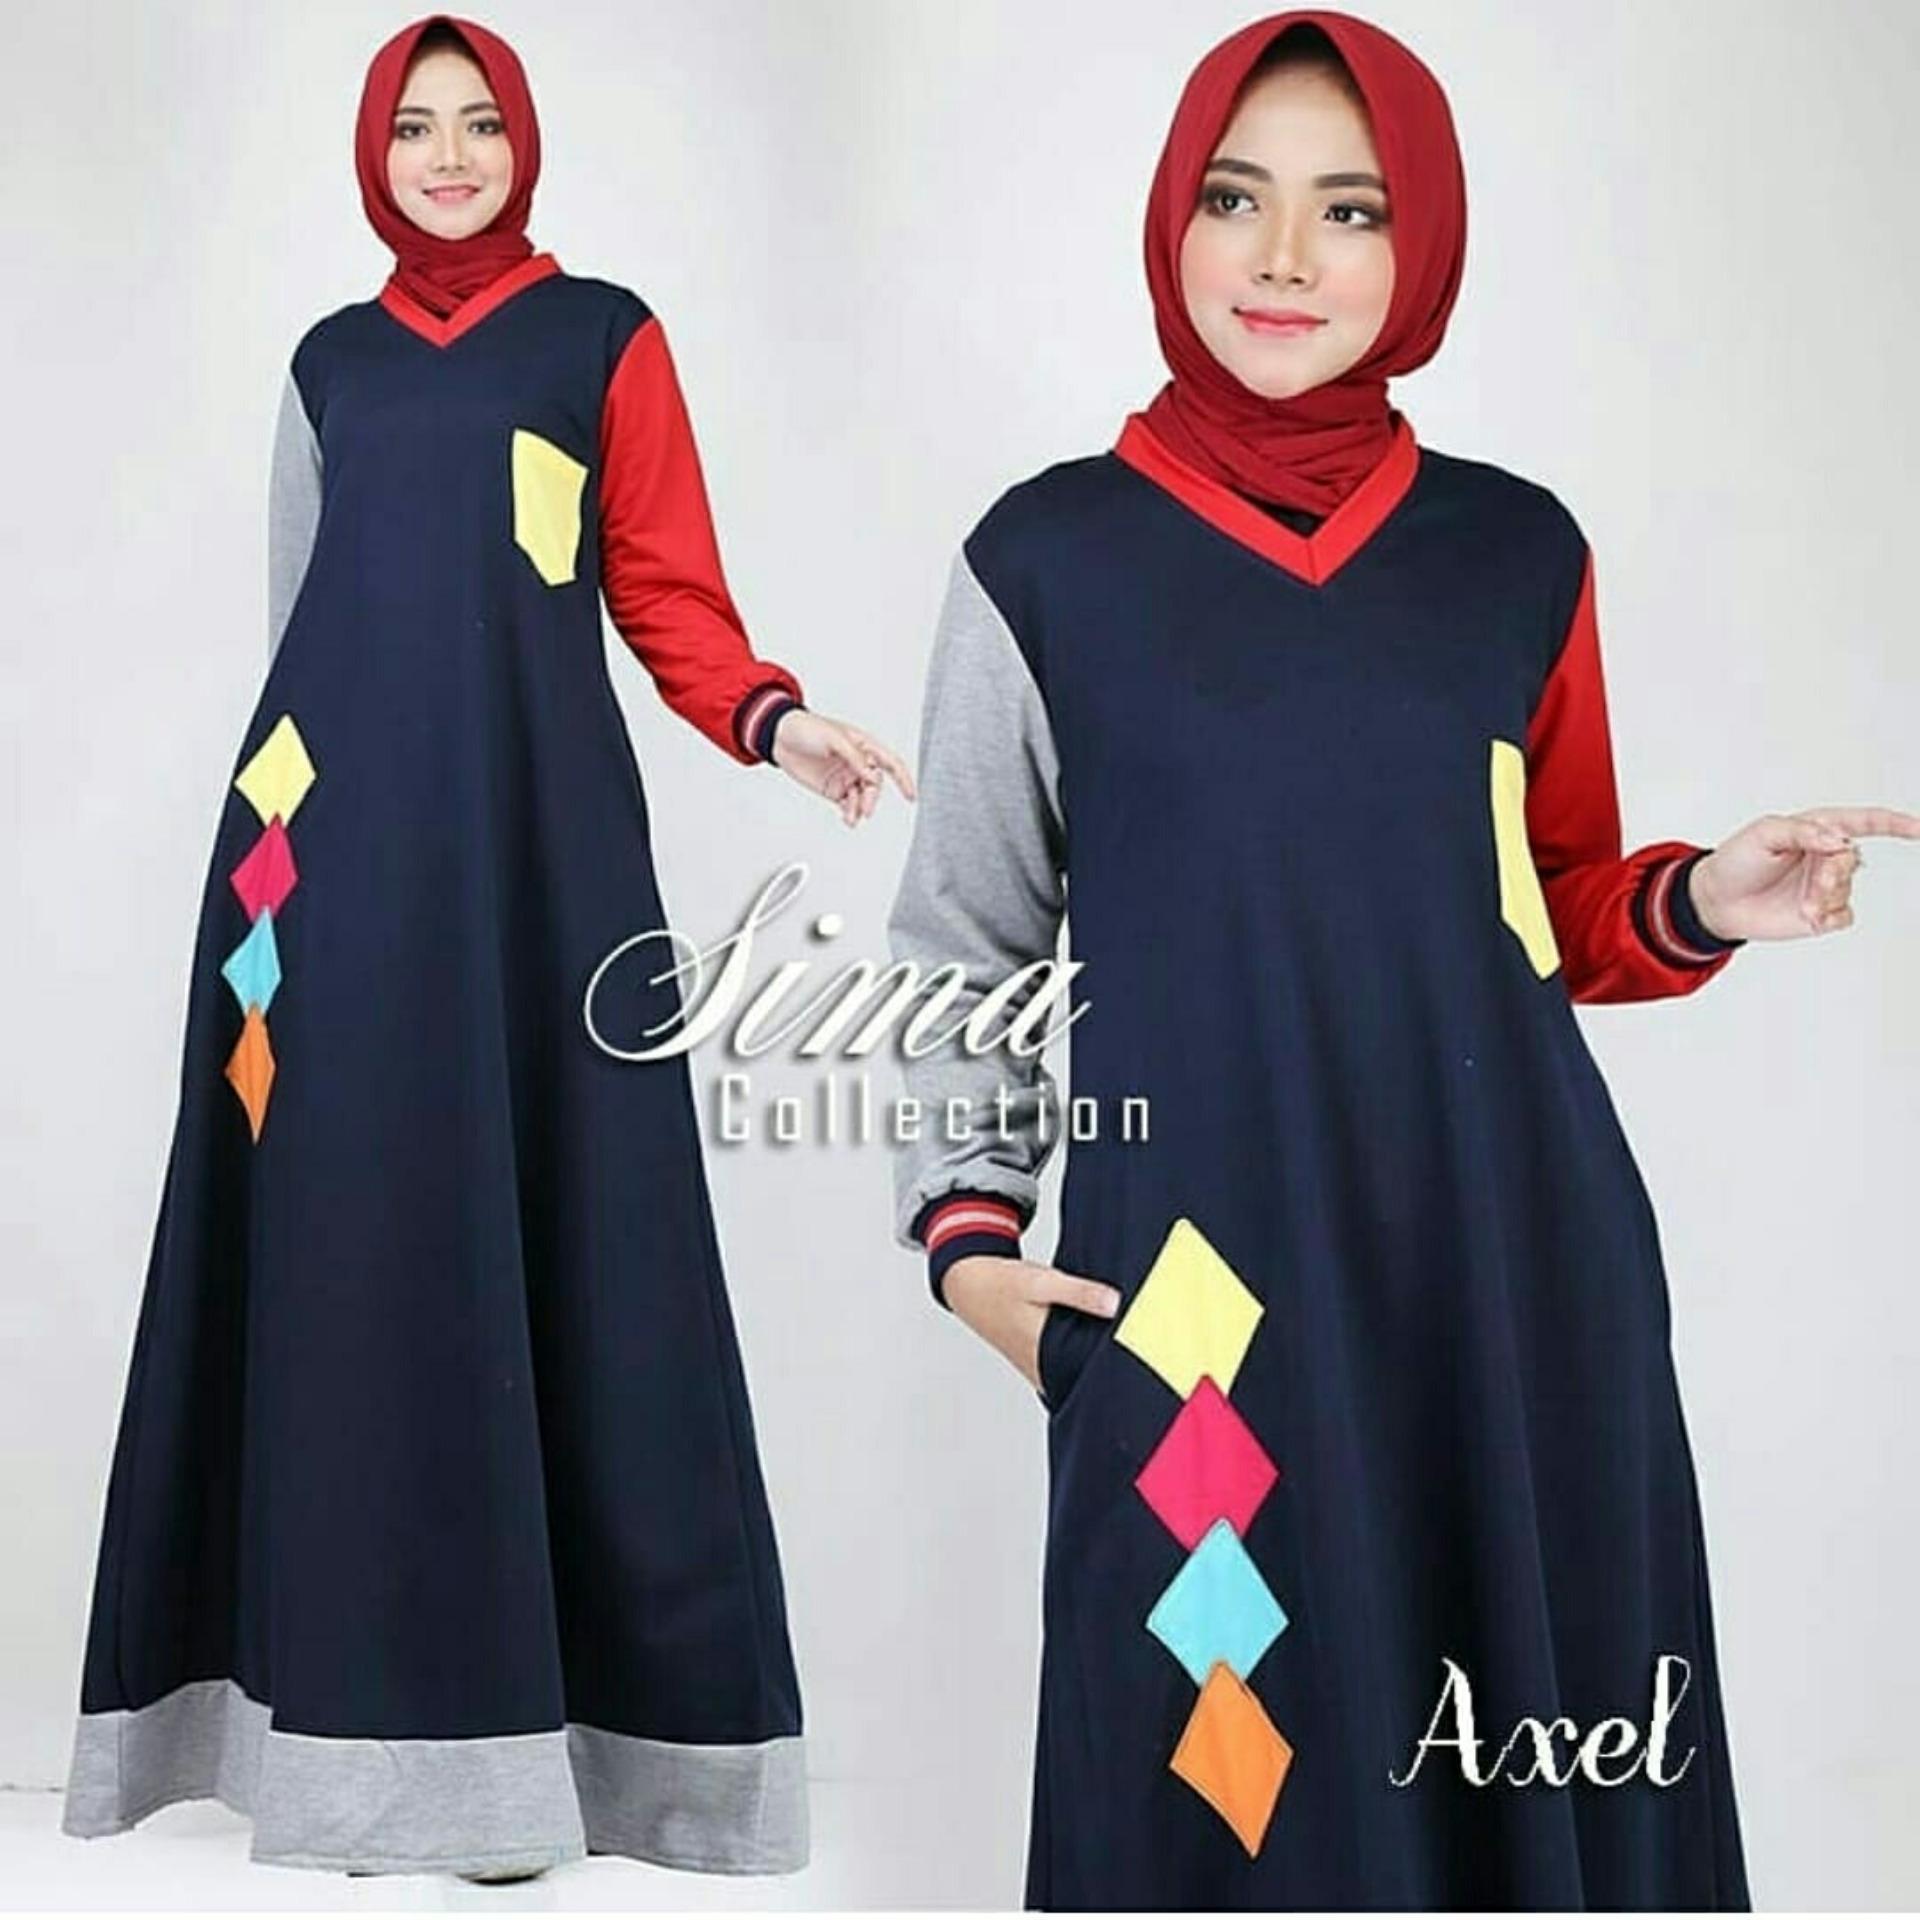 ... Celana Wanita Cullote Jeans Premium. Source · amazing watch - Pakaian Muslimah Wanita Fashionable - Maxy Axel